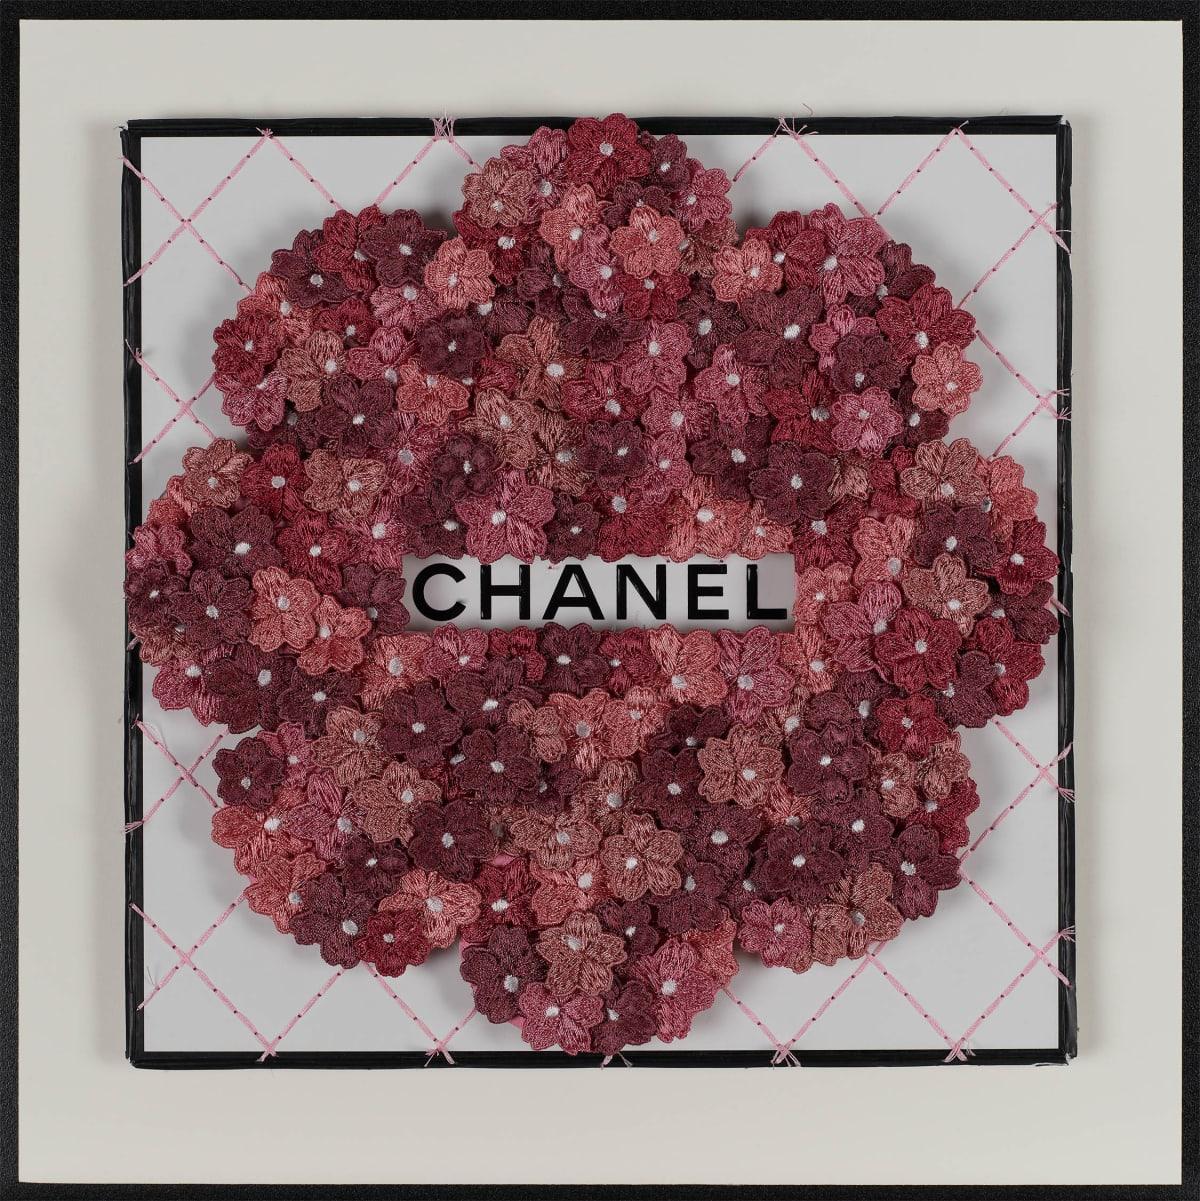 Stephen Wilson, Chanel Flower Flower, Wine, 2019